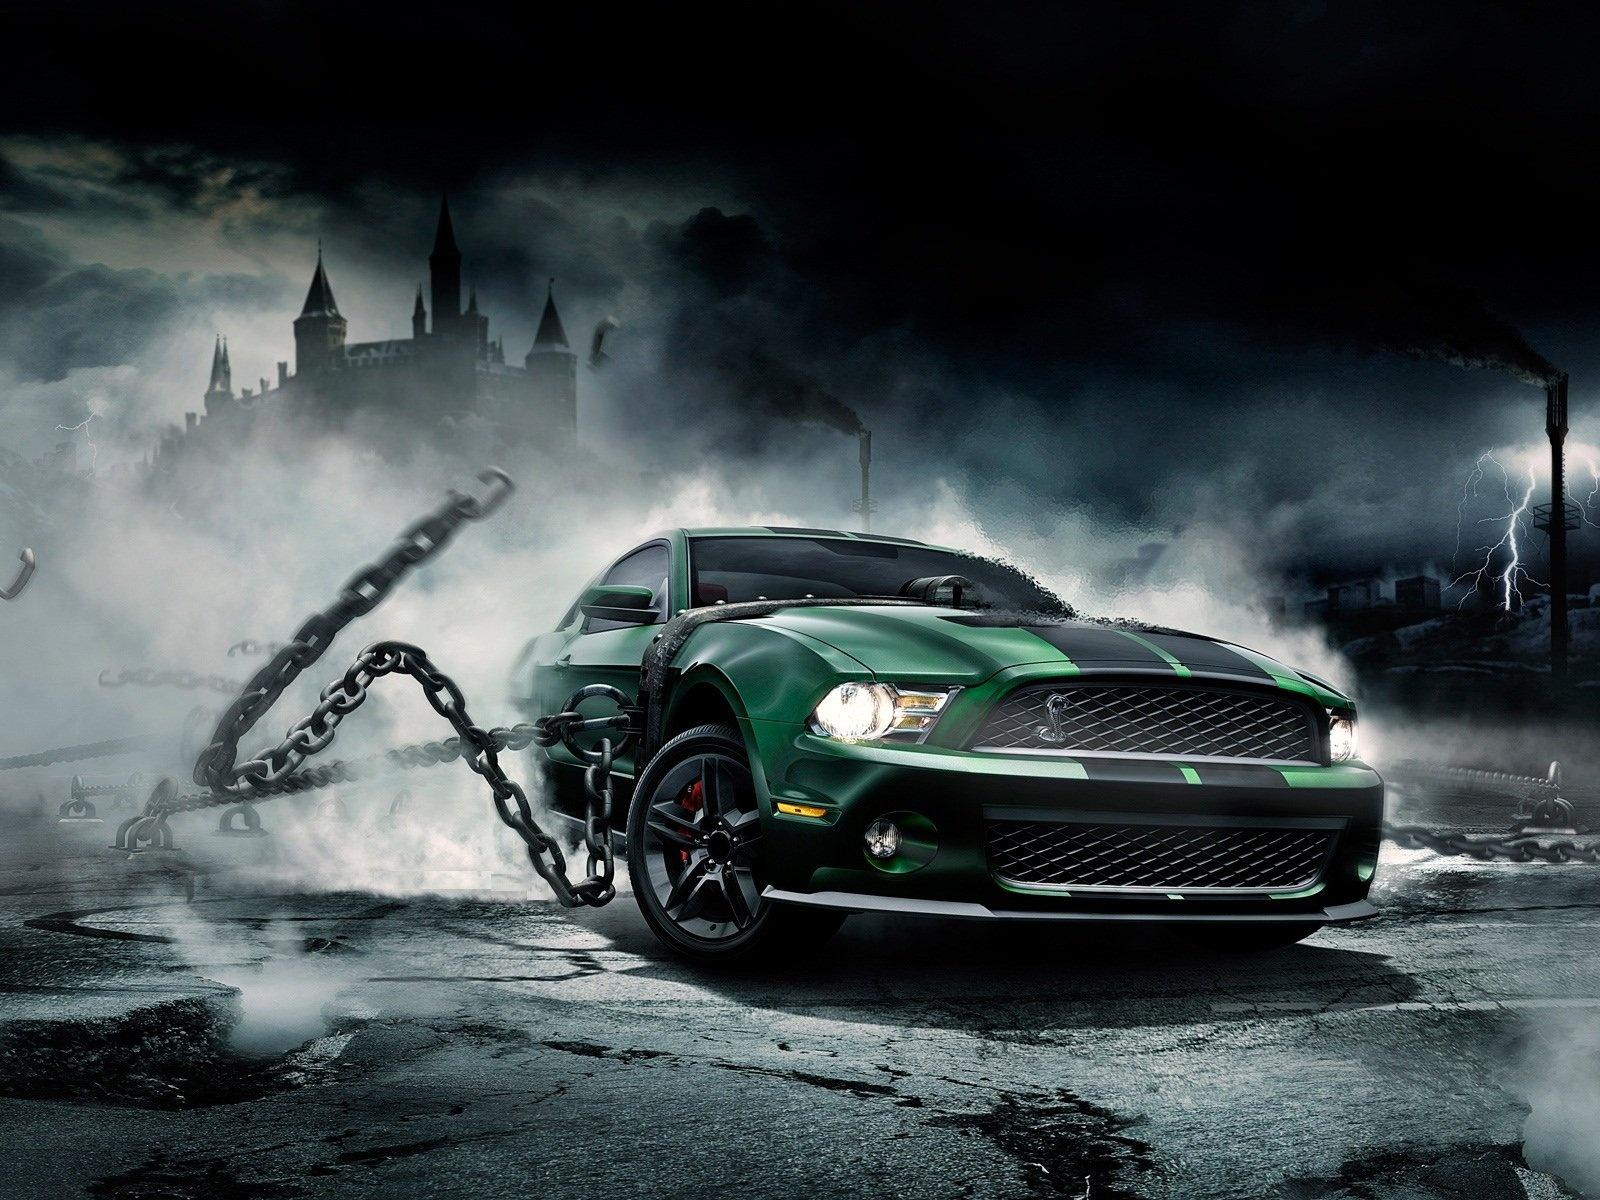 50 ] Cool Car Wallpaper Backgrounds On WallpaperSafari